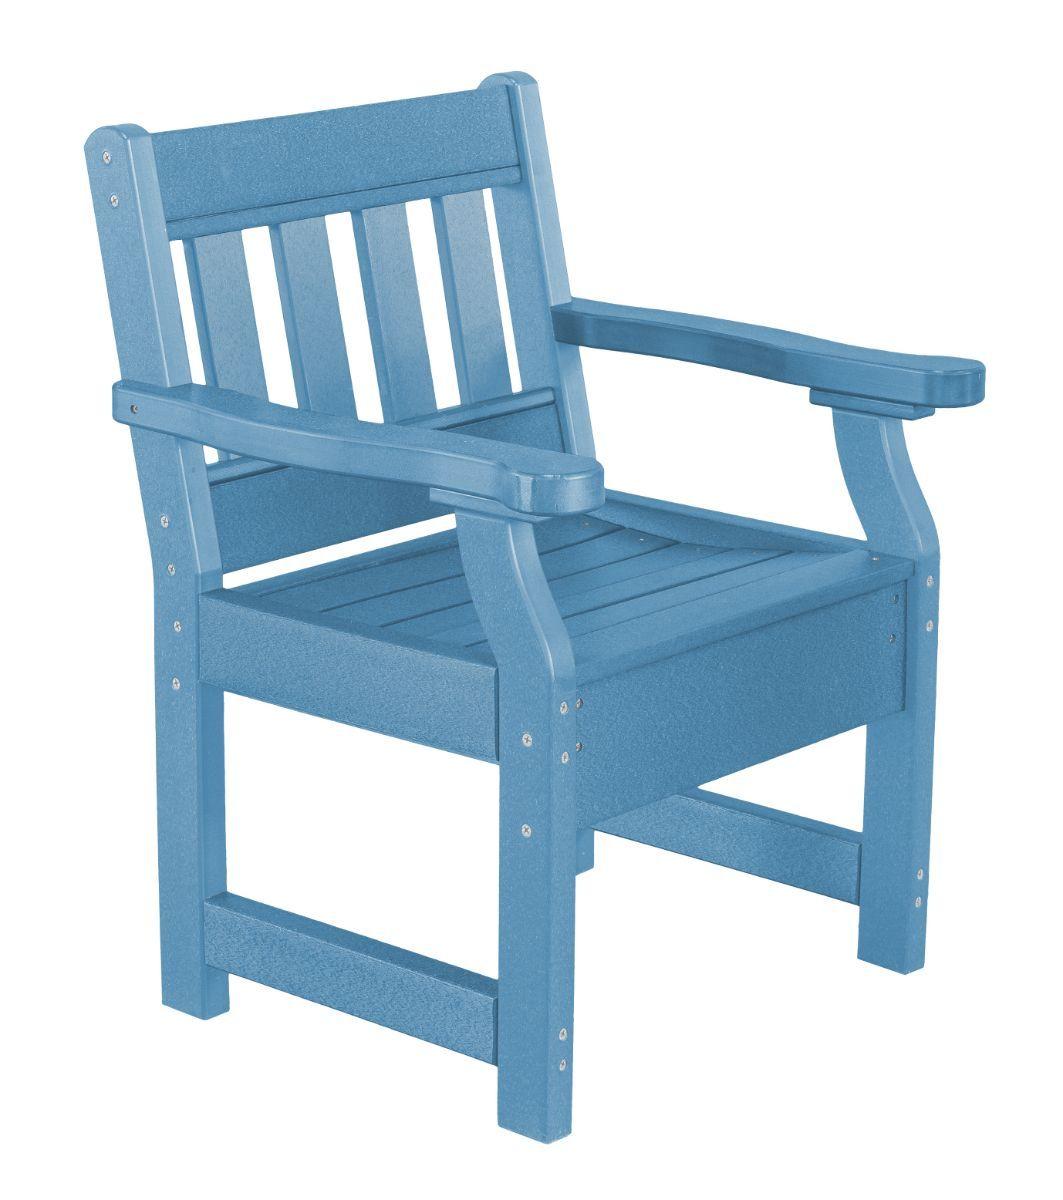 Powder Blue Aden Patio Chair